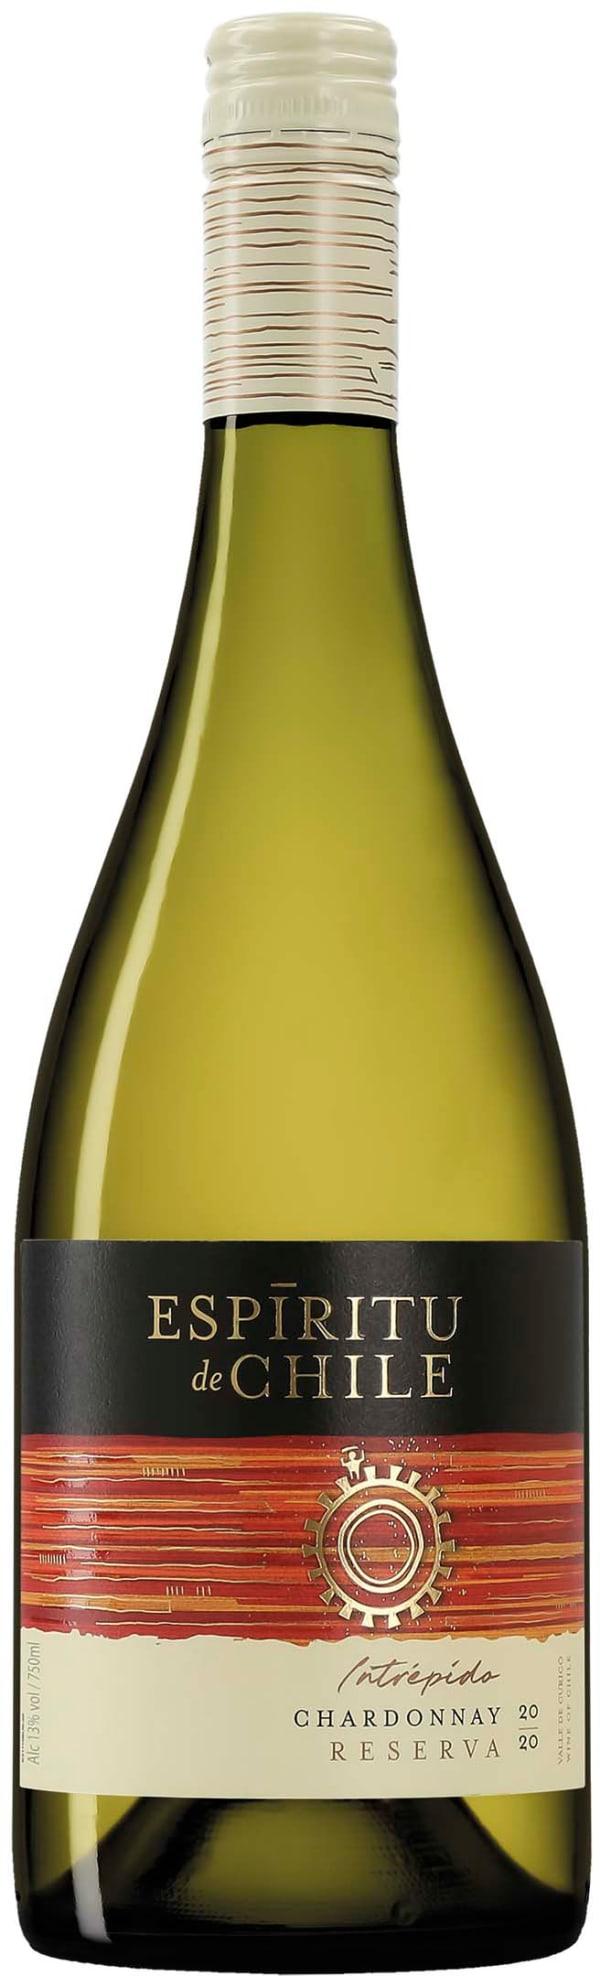 Espíritu de Chile Reserva Chardonnay 2019